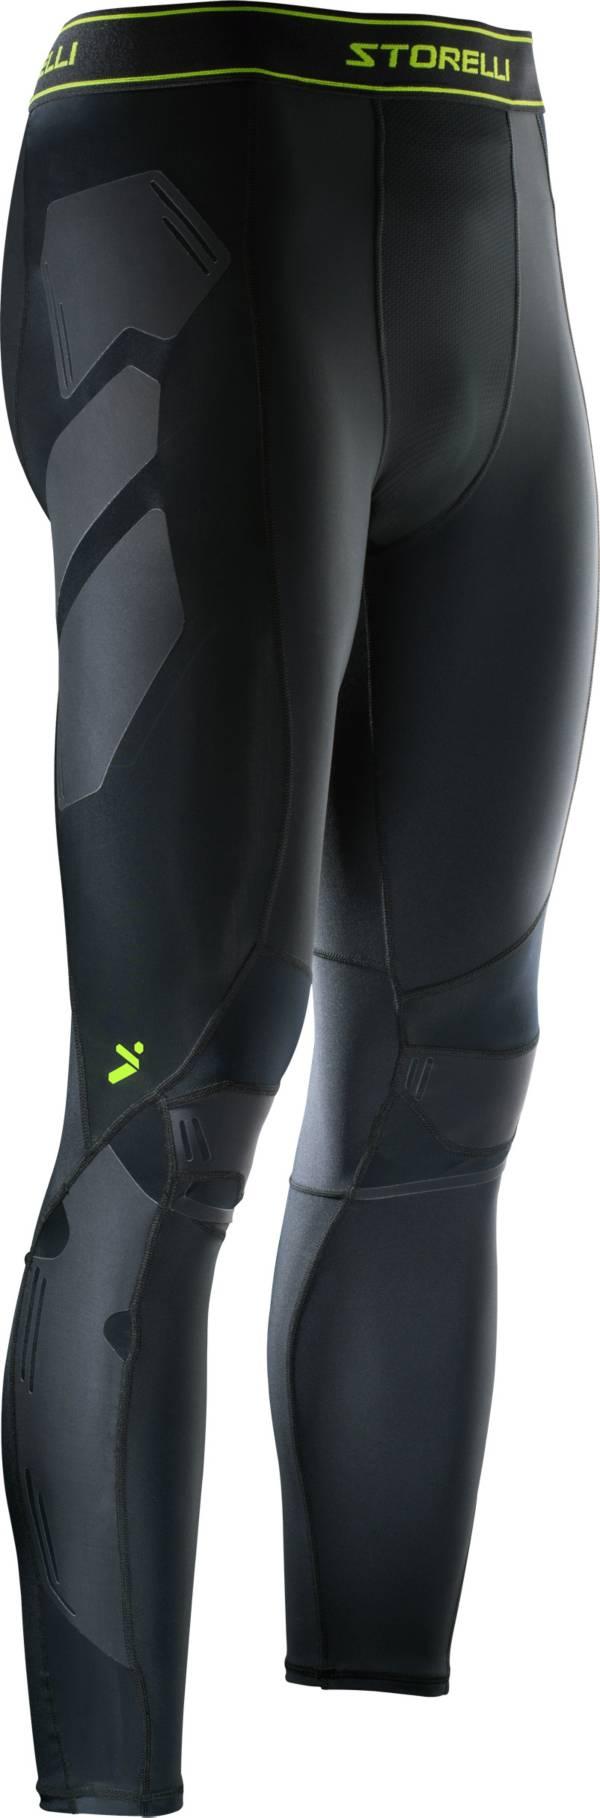 Storelli Youth BodyShield Anti-Abrasion Soccer Leggings product image